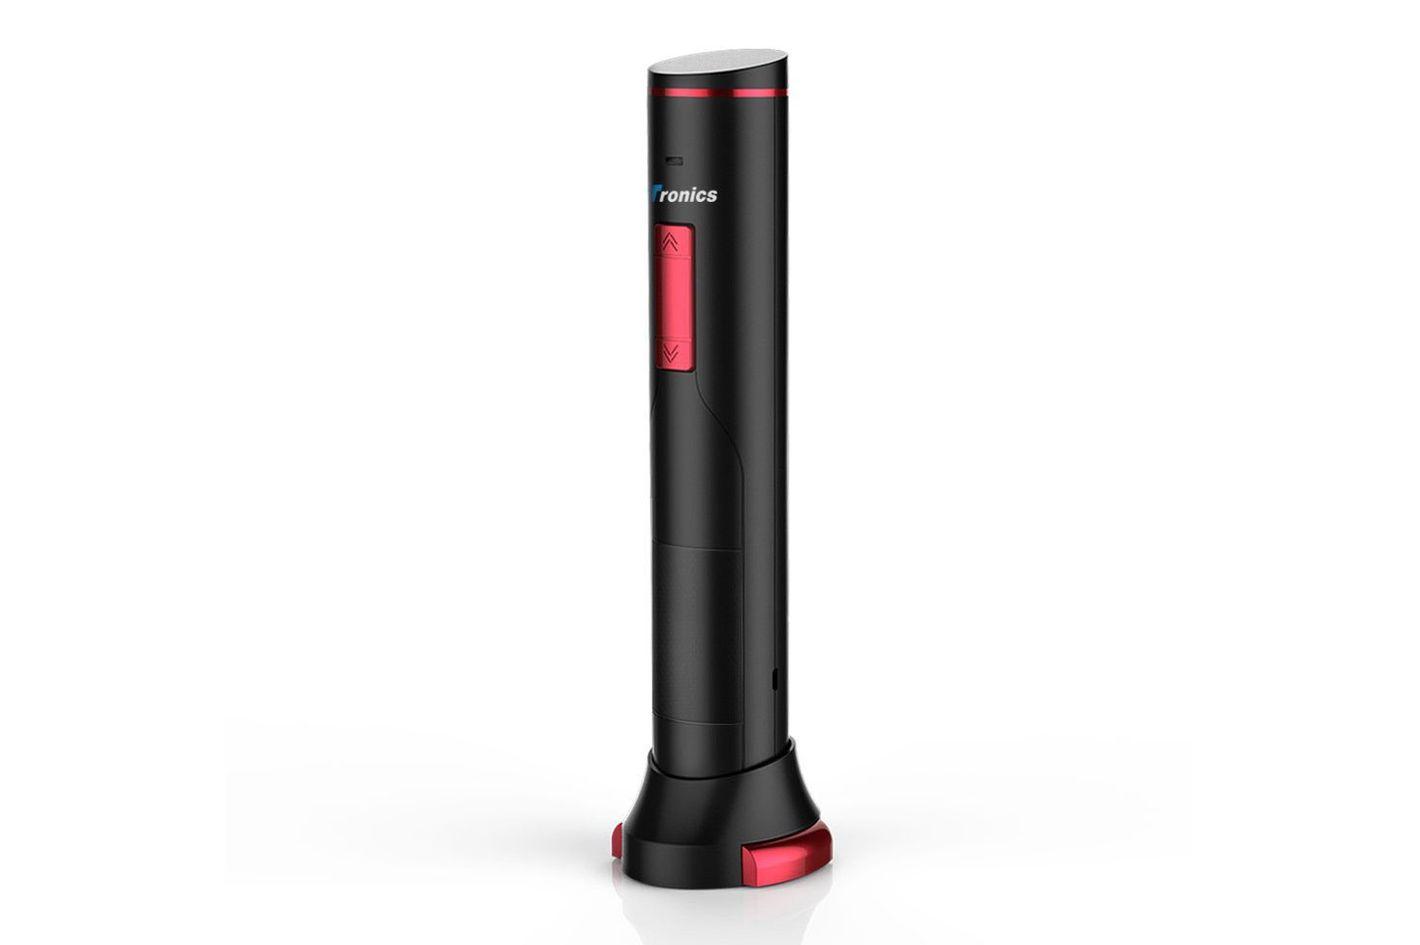 iTronics IC700 Electric Wine Opener